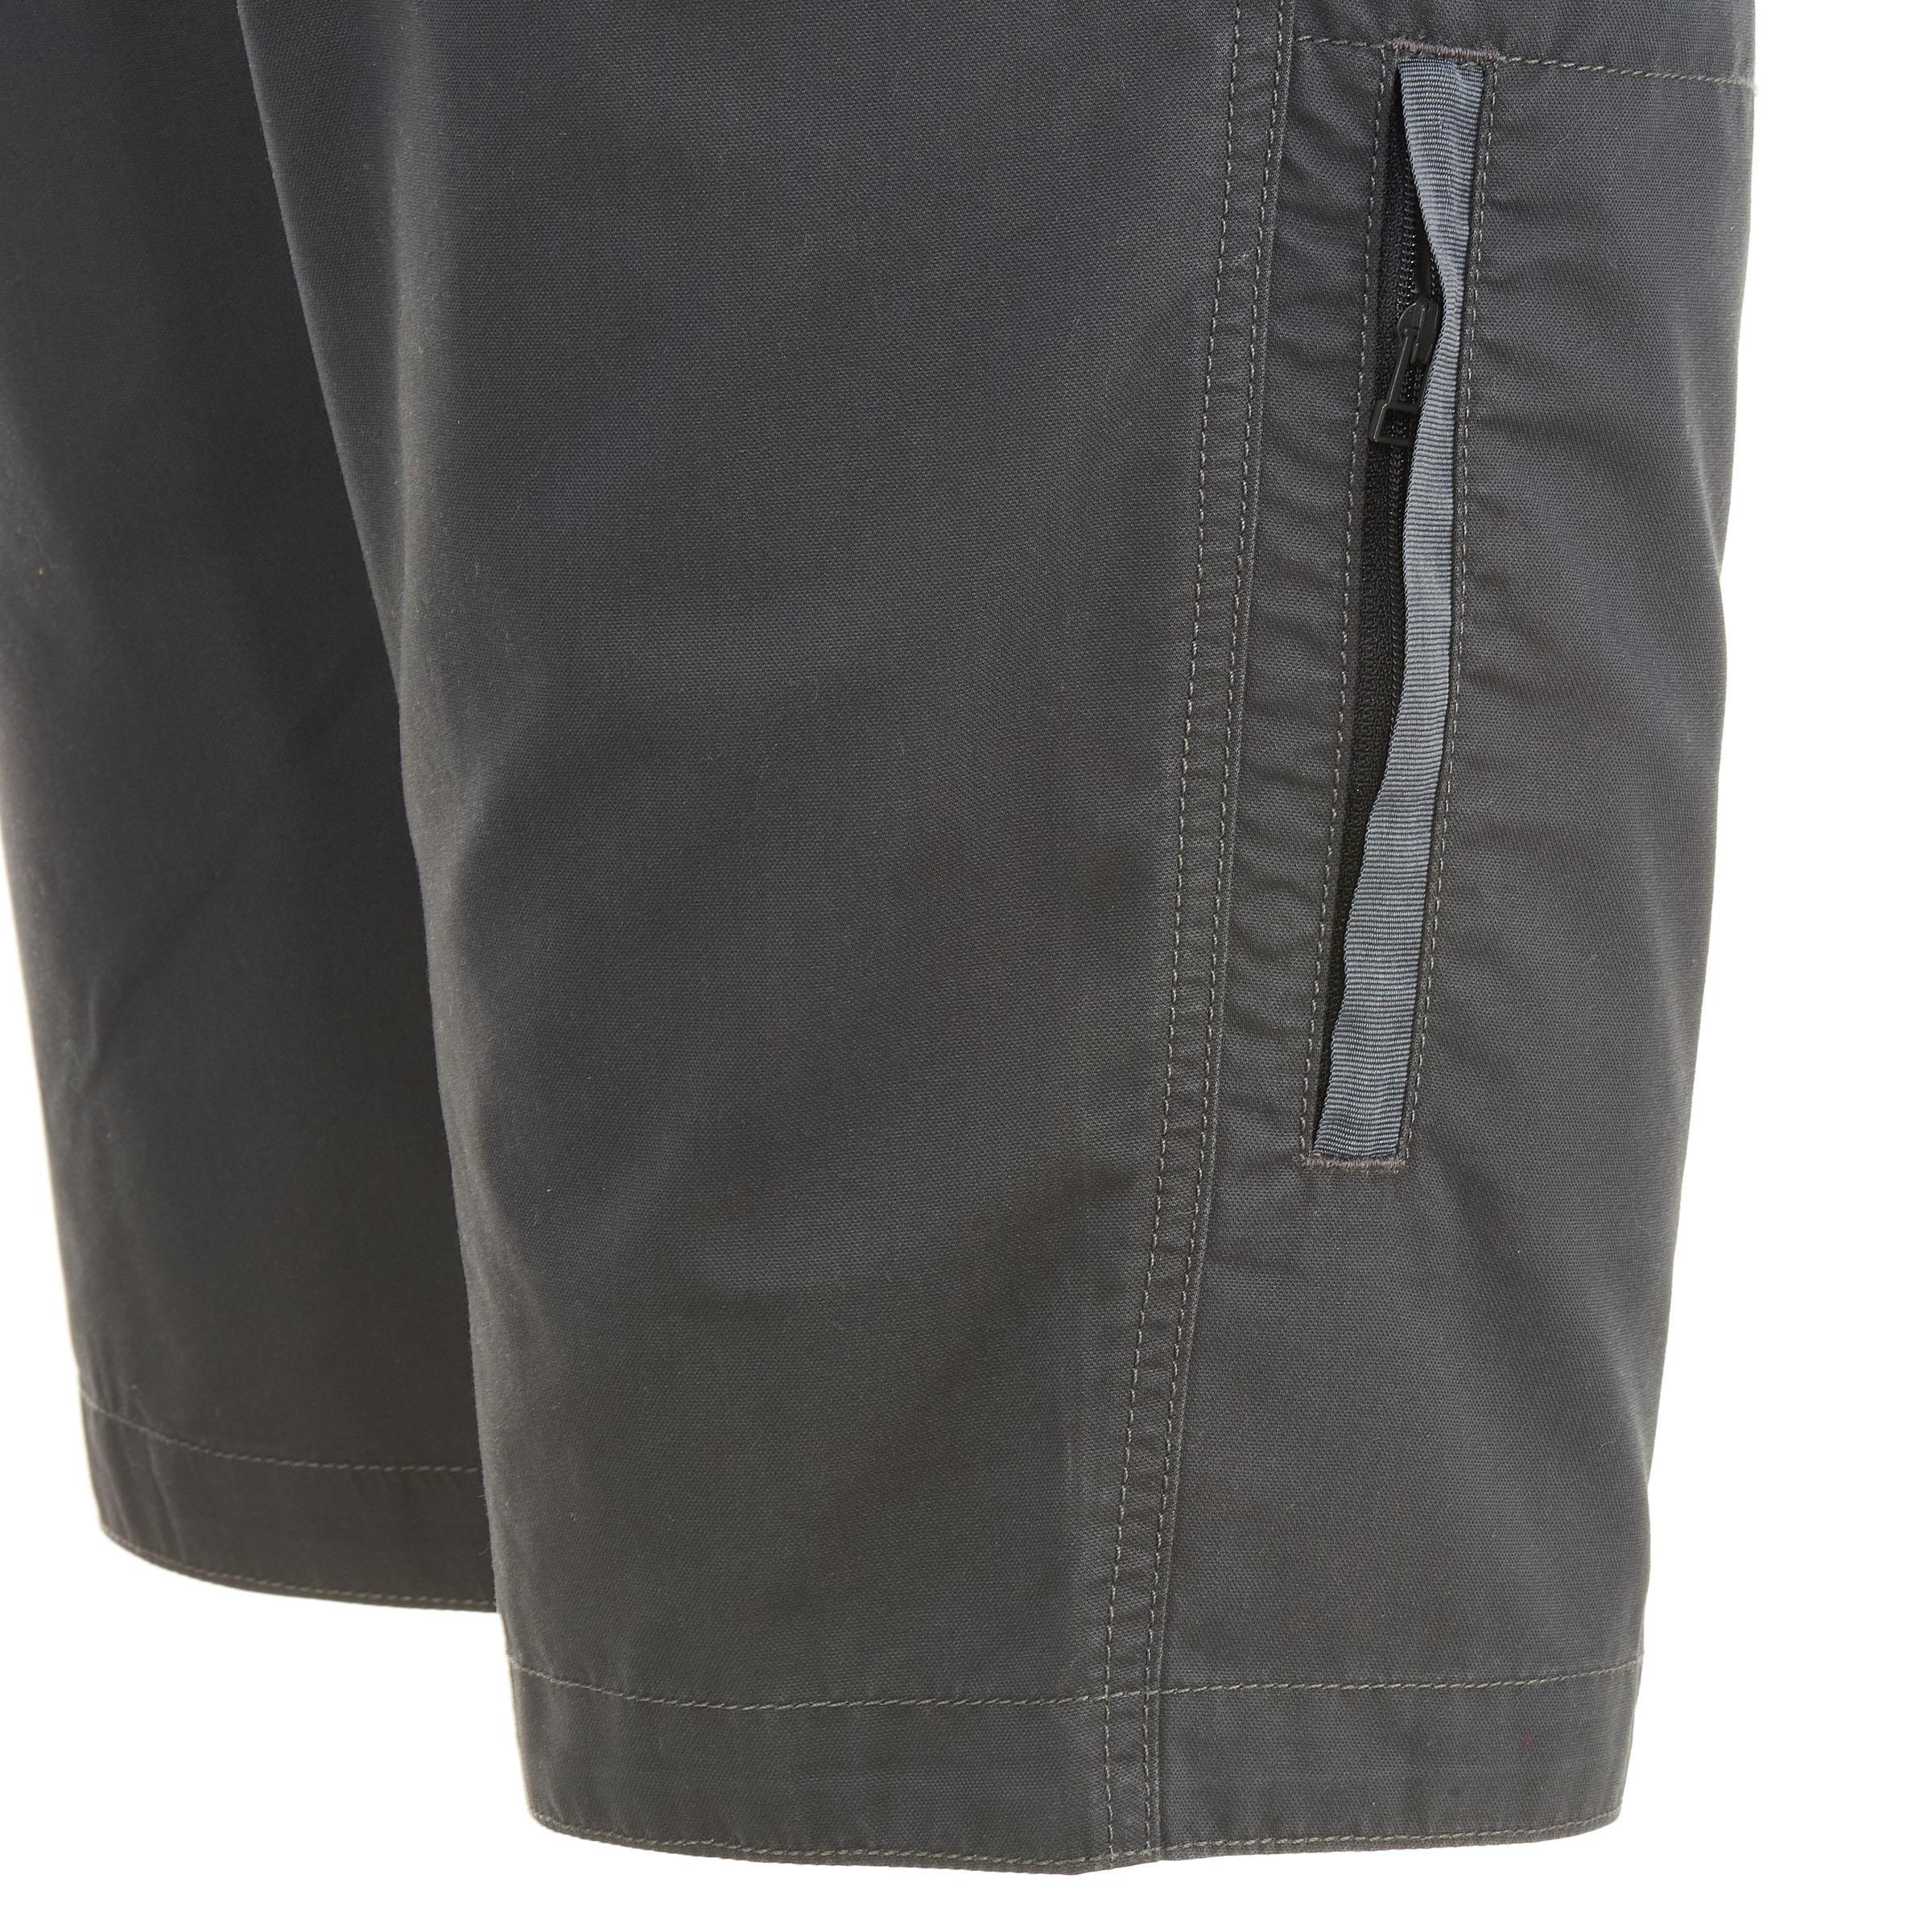 Men's Hiking Shorts NH500 - Grey